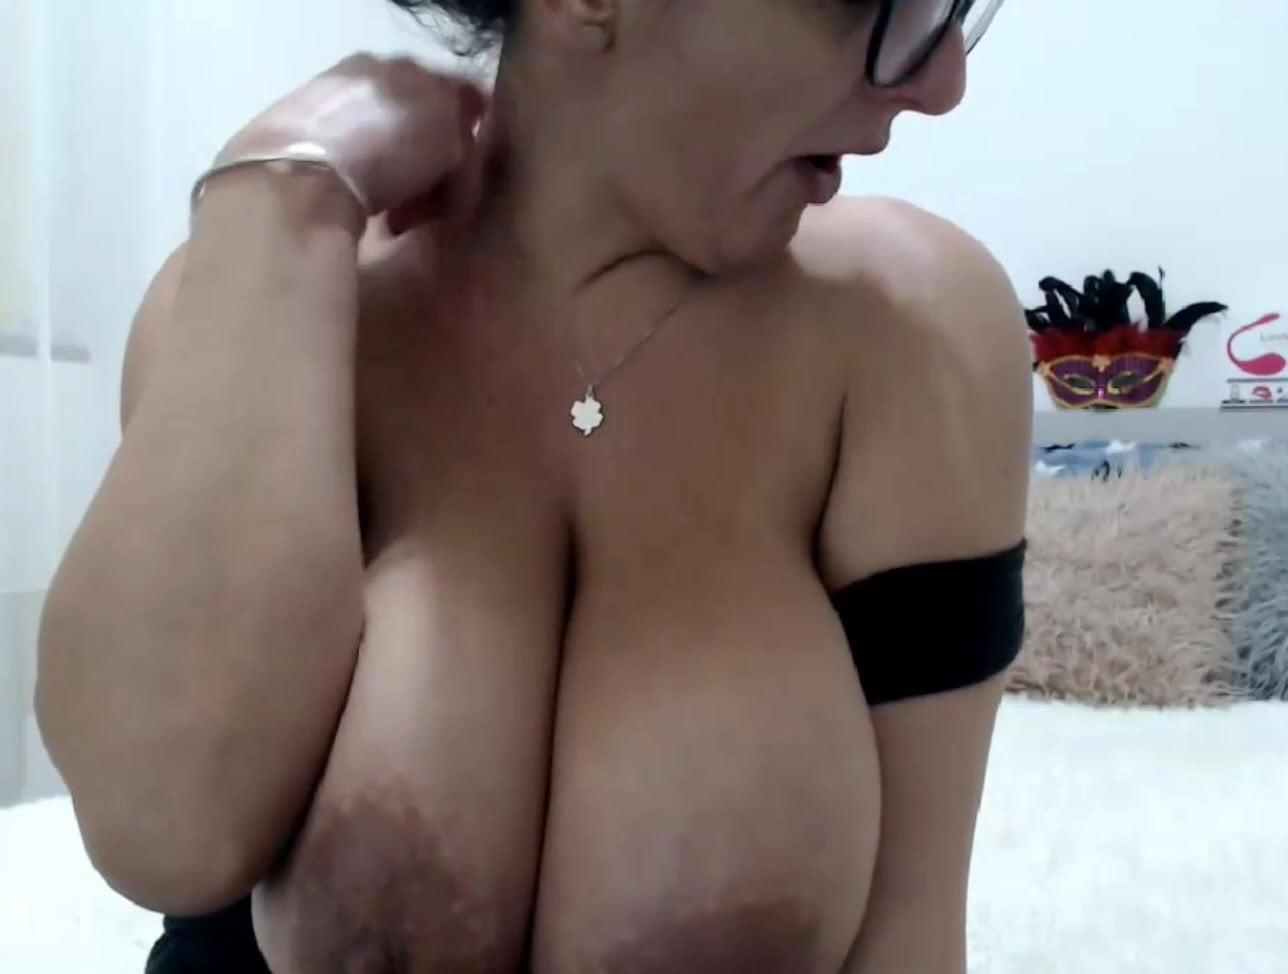 Swinging boob videos